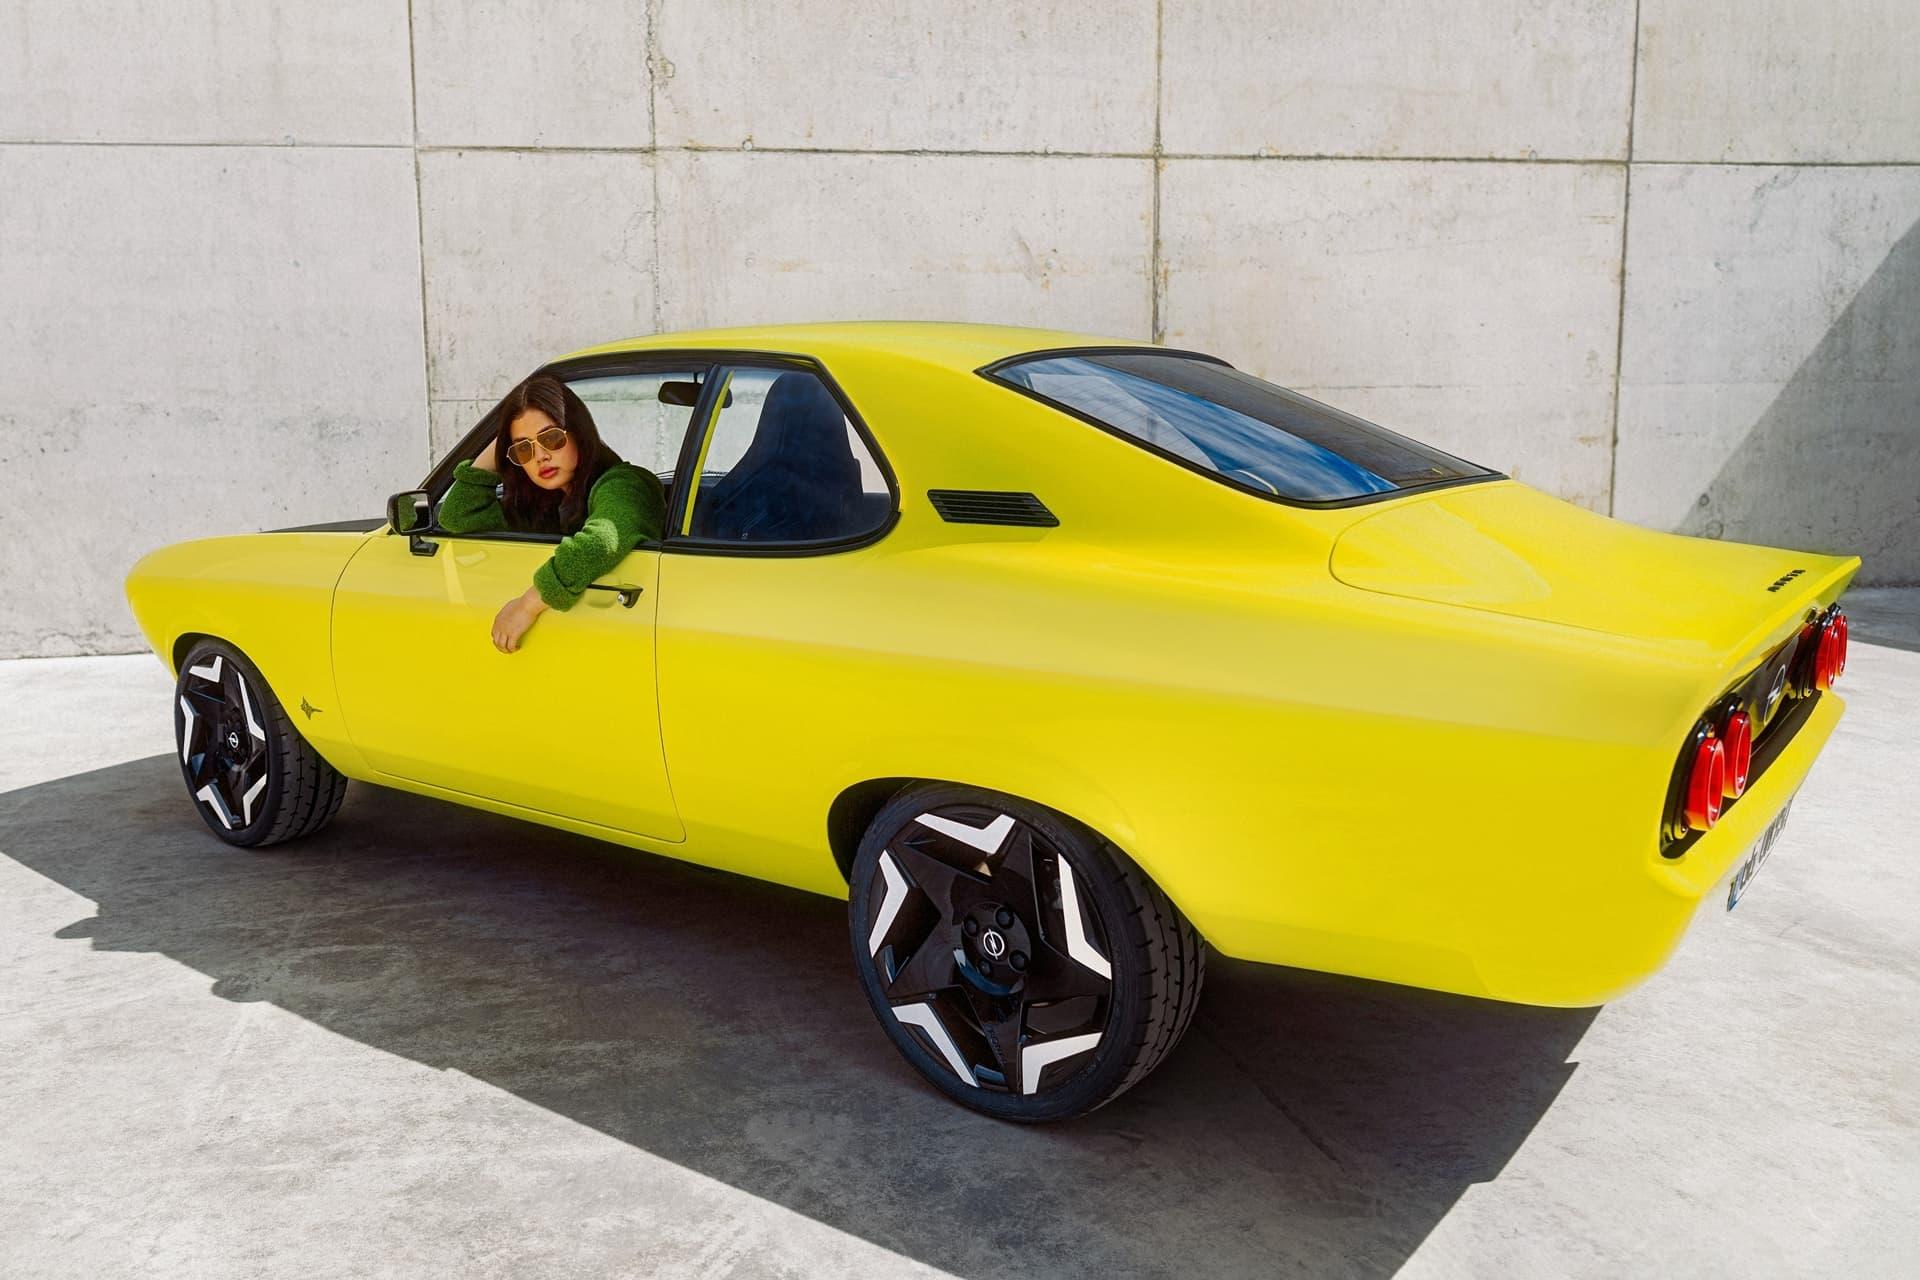 Opel Manta Gse Elektromod 2021 0521 002